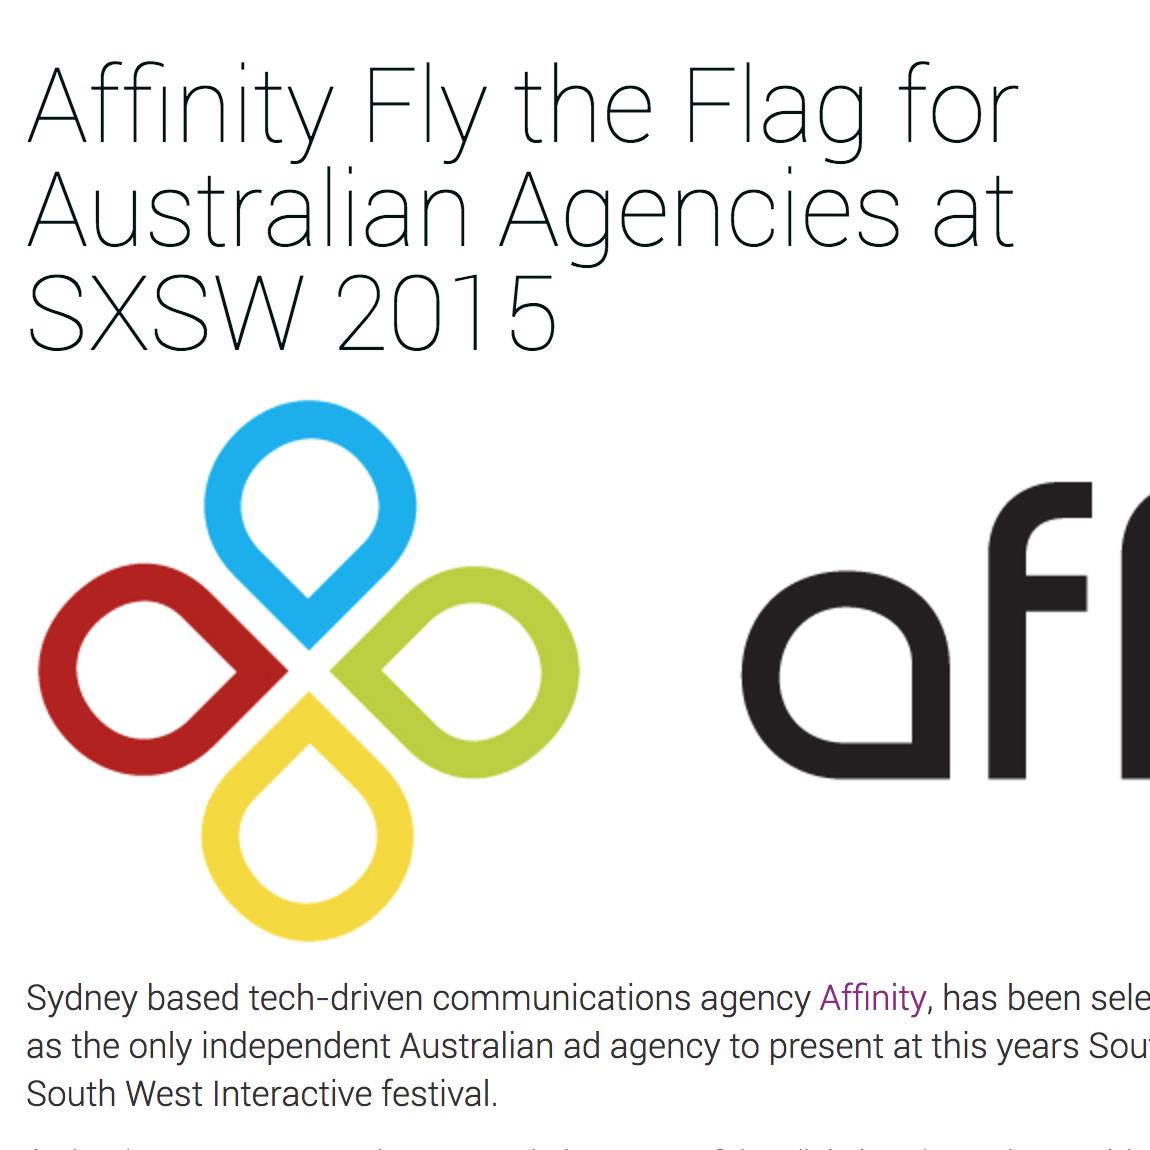 AIMIA  Affinity Fly the Flag for Australian Agencies at SXSW 2015